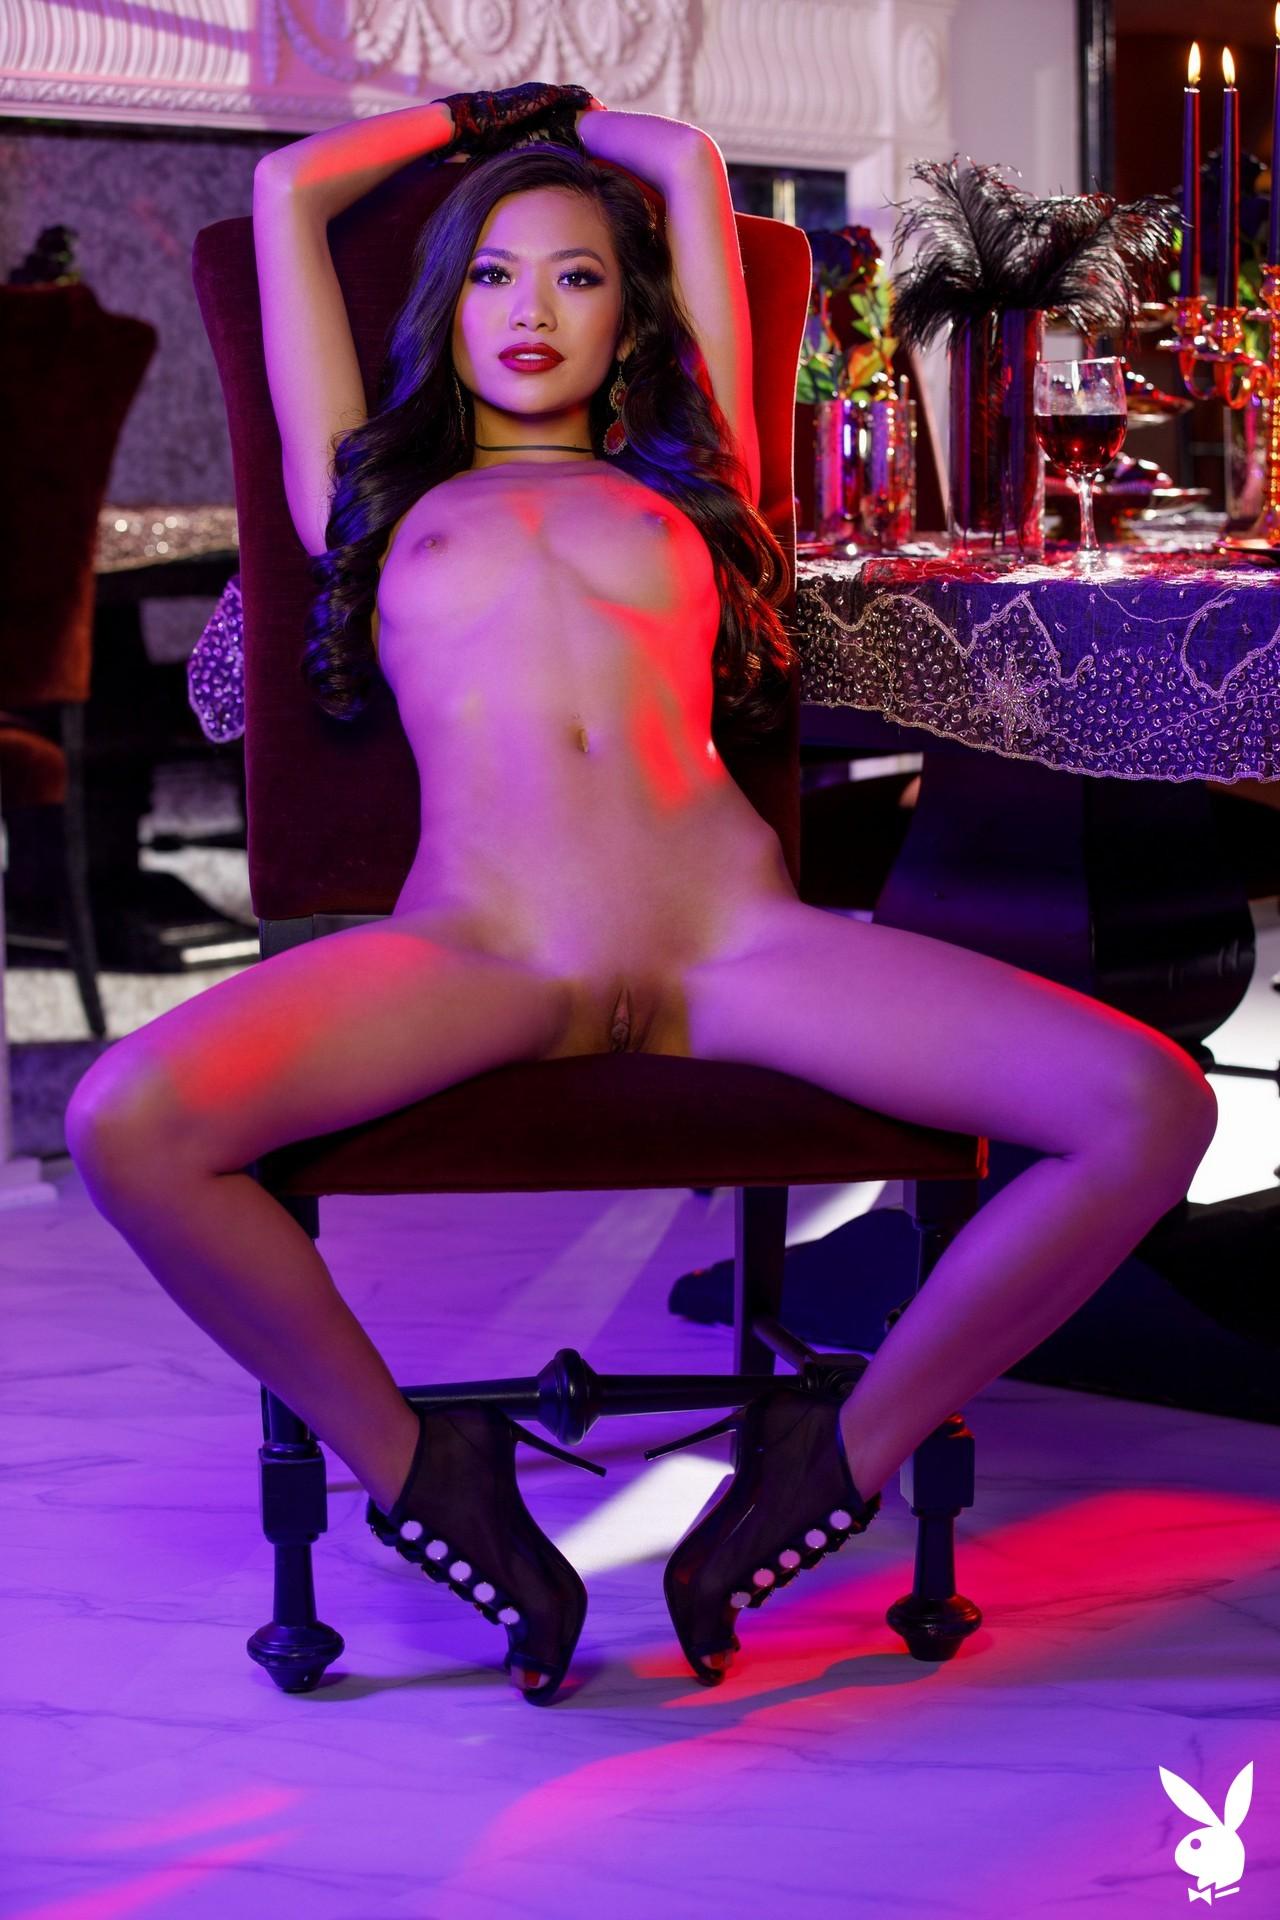 Vina Sky In Midnight Indulgence Playboy Plus (17)